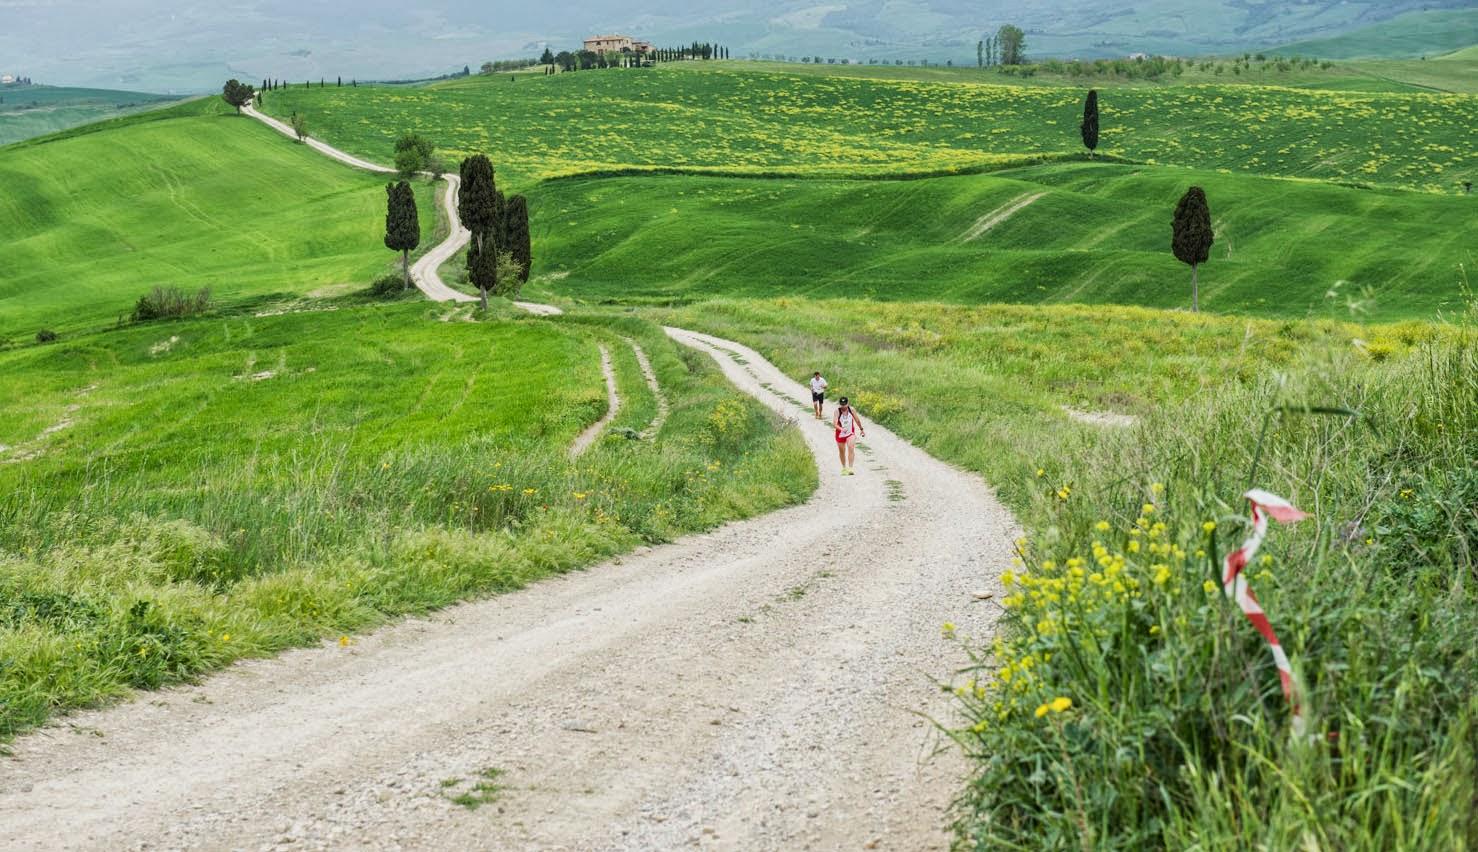 tuscanycrosing 2013-103j